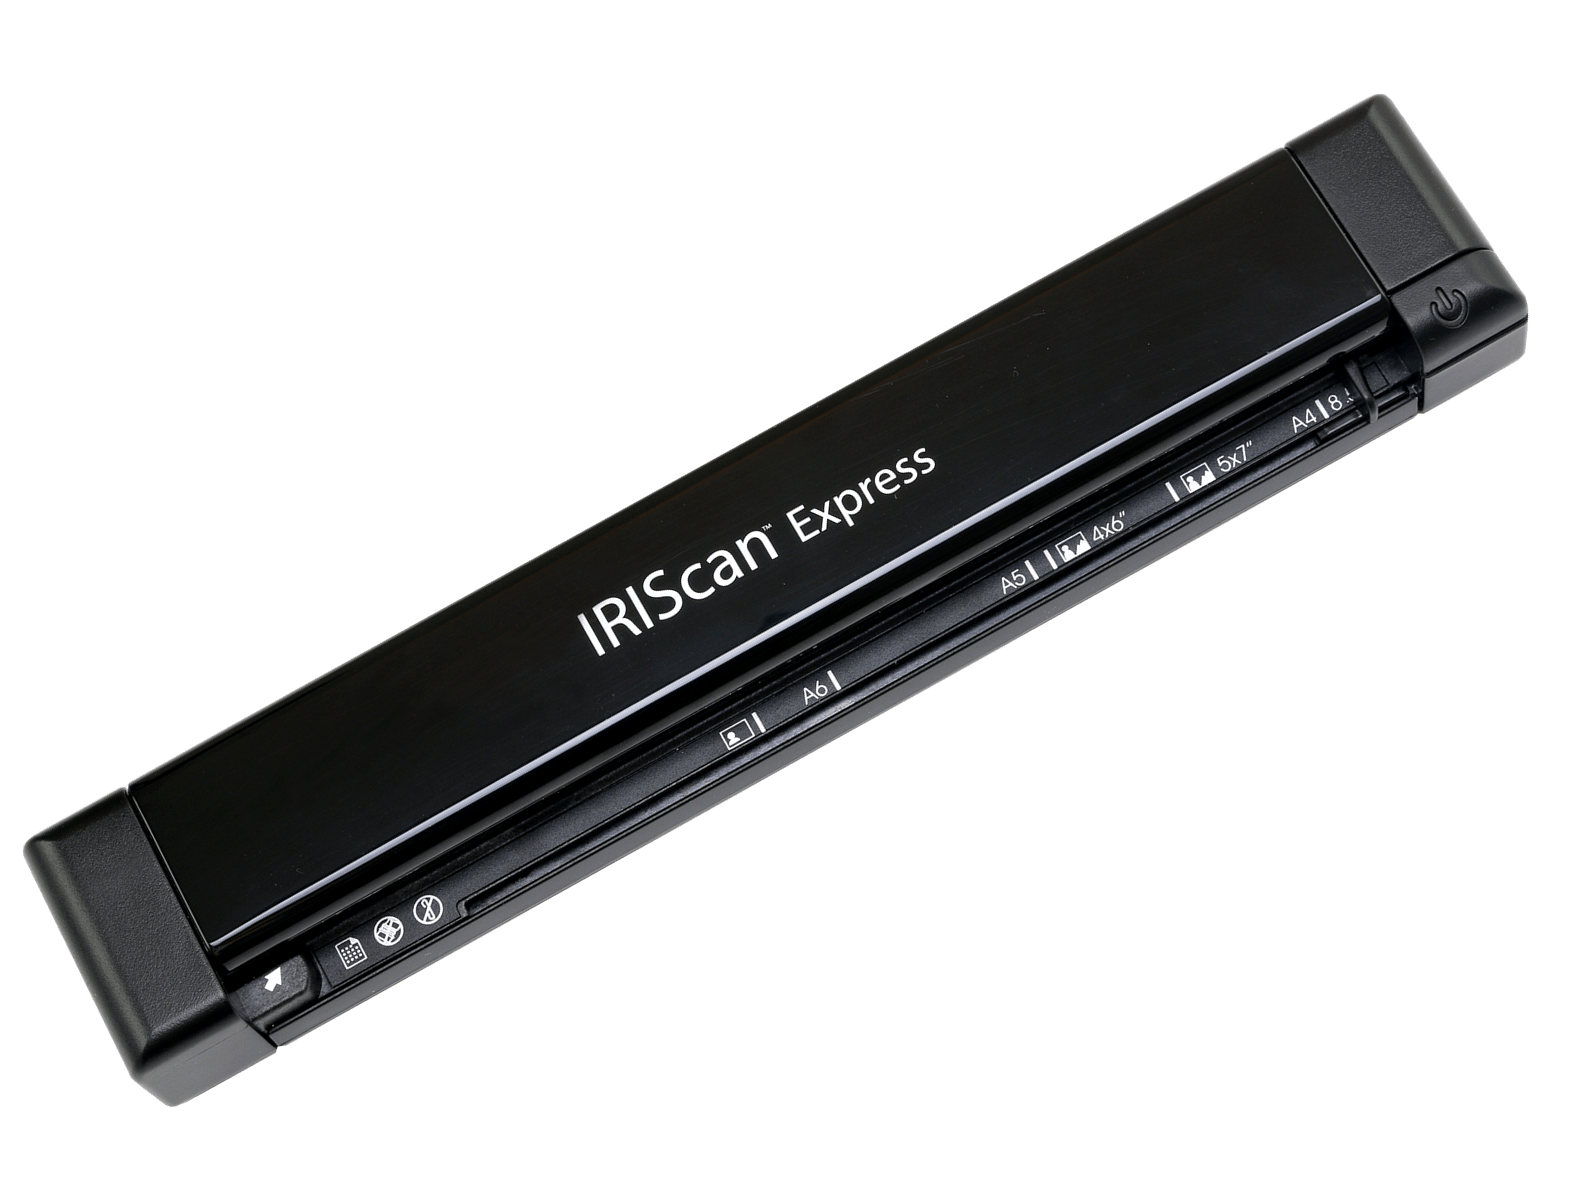 IRIScan Express 4 - Licht en ergonomisch